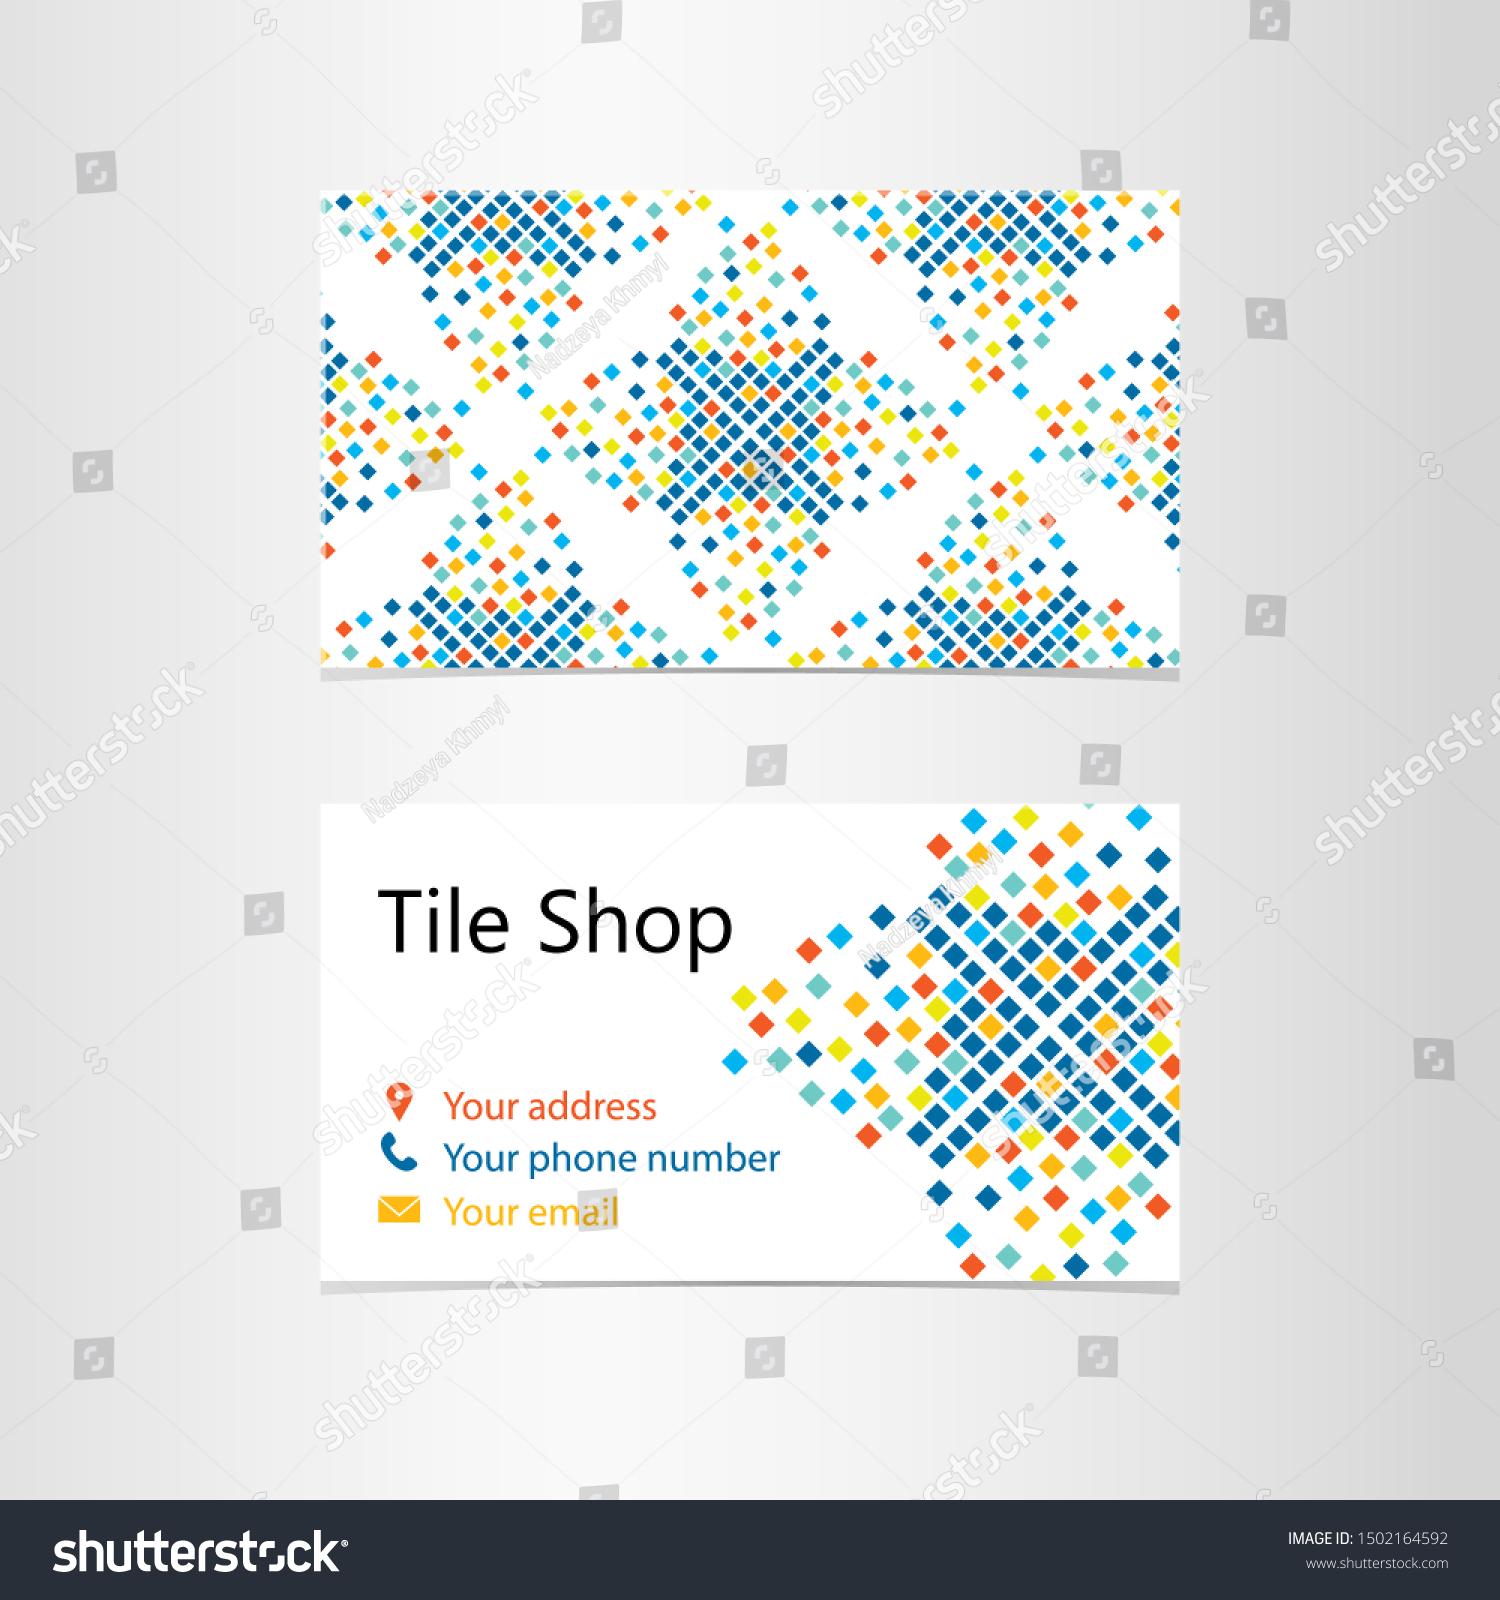 https www shutterstock com image vector vector business card template tile shop 1502164592